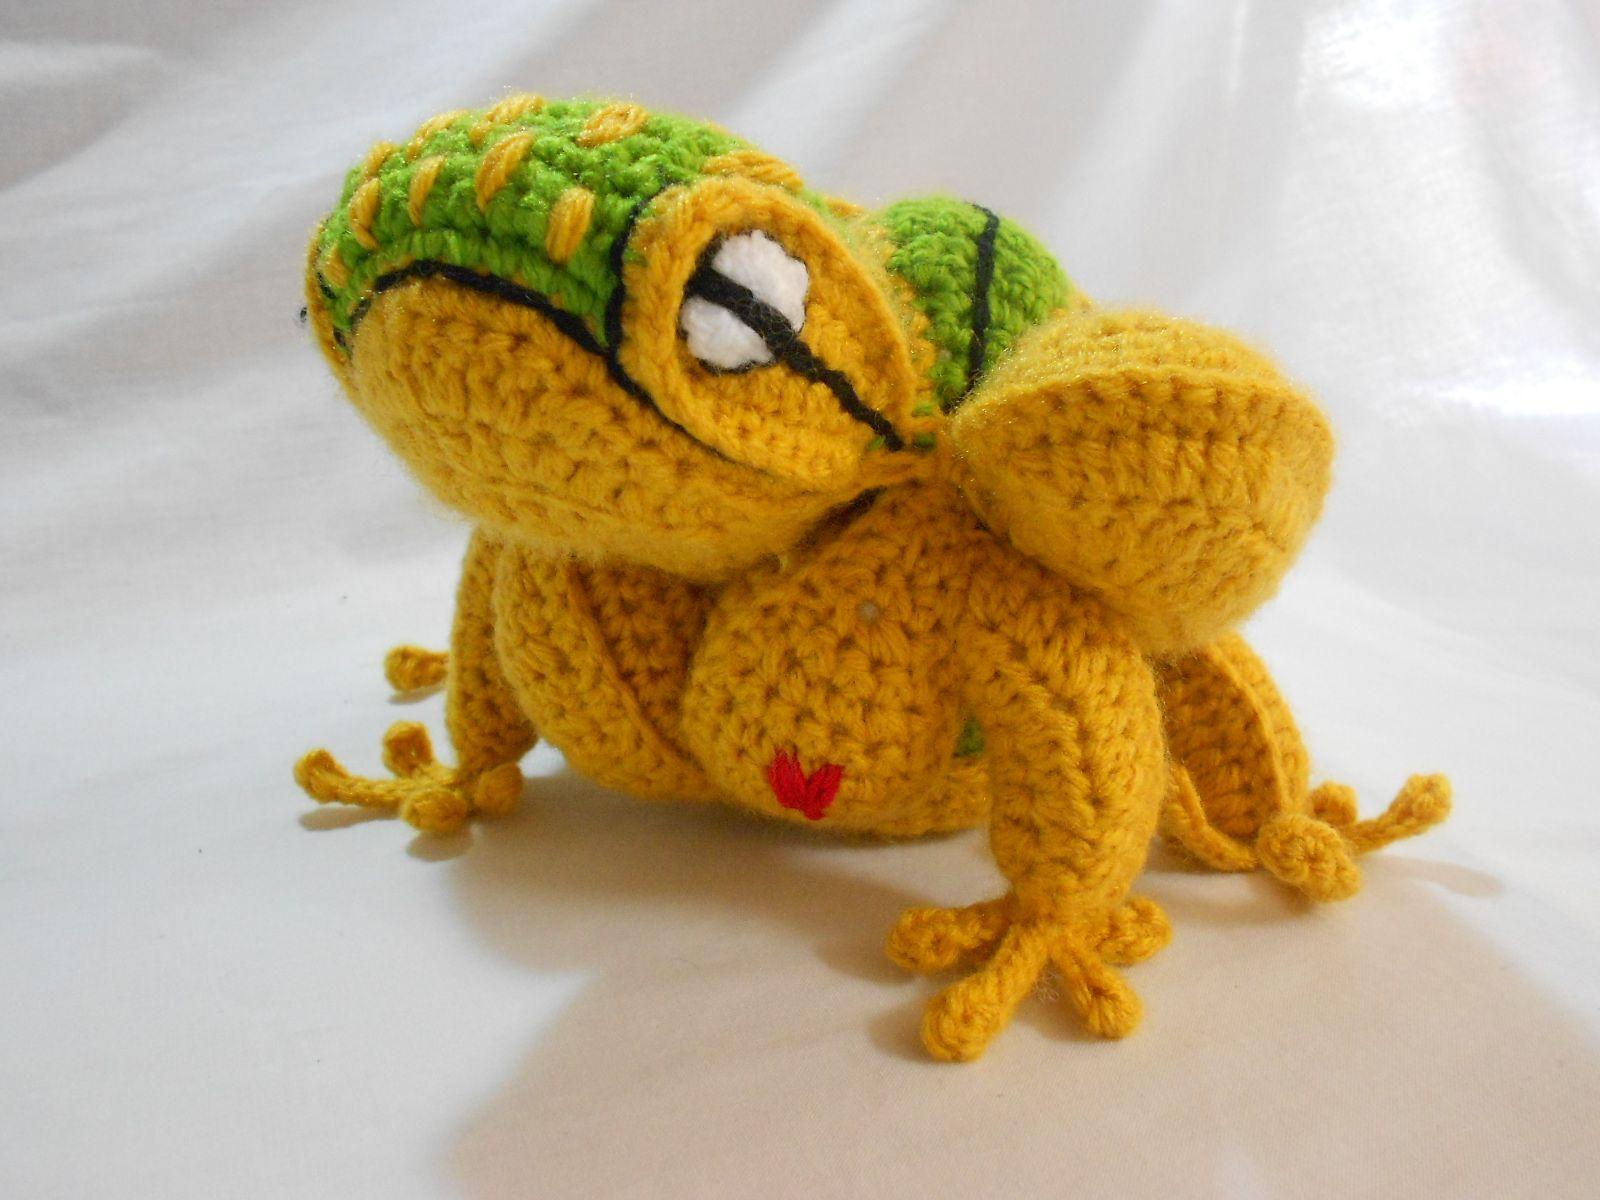 Amish Puzzle Ball Ozy Bella Zak Shak. Golden tree frog ...